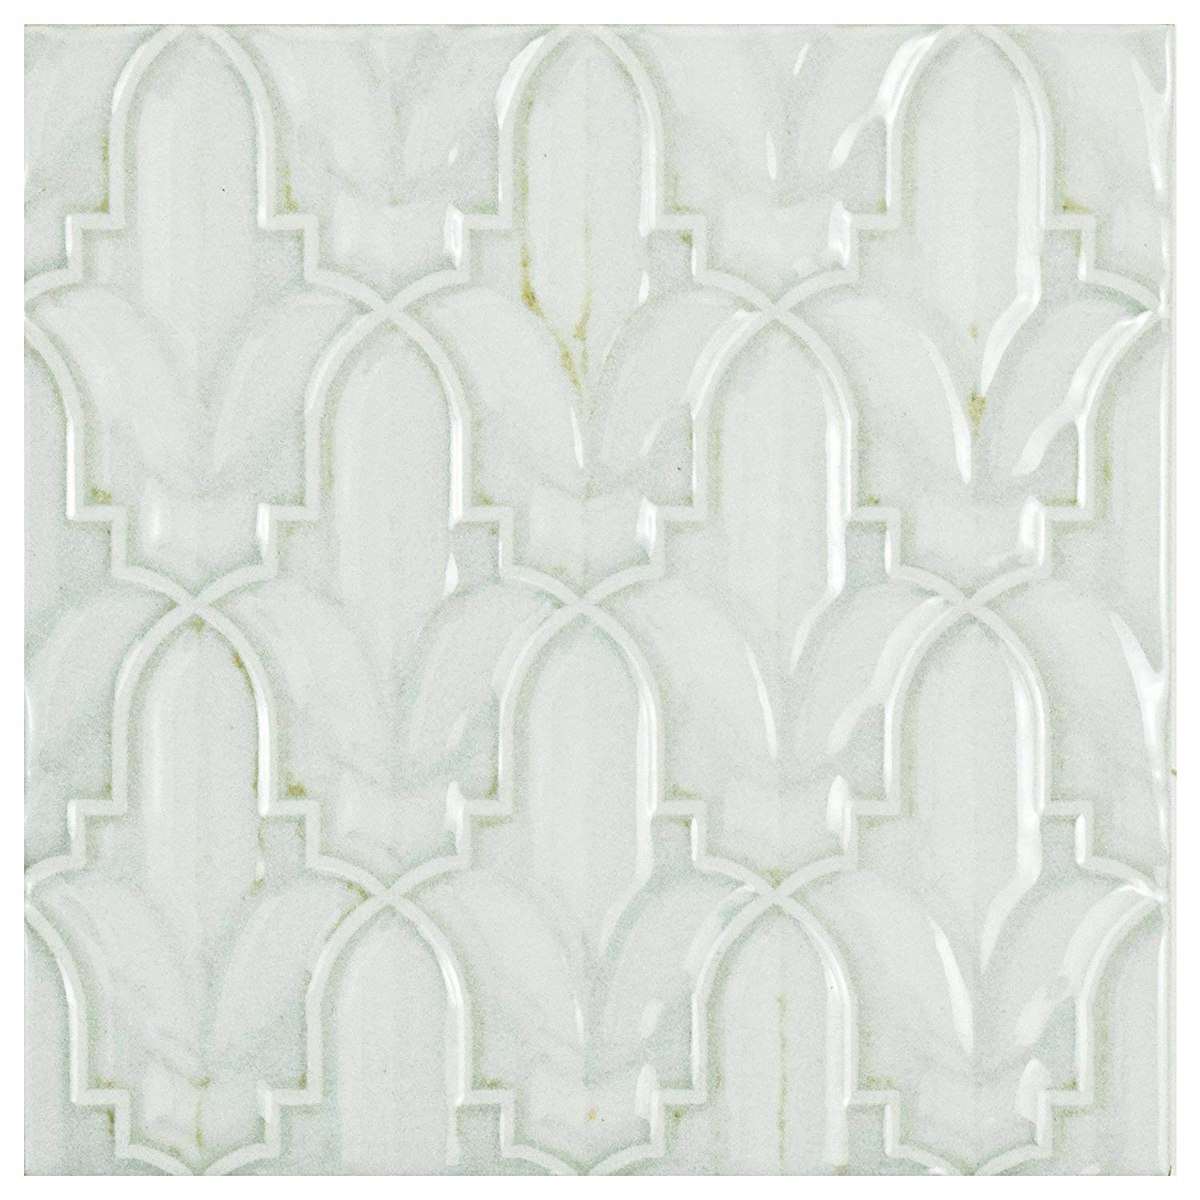 Somertile Wcalsdb Campo Lis Dcor Ceramic Wall Tile X 5875